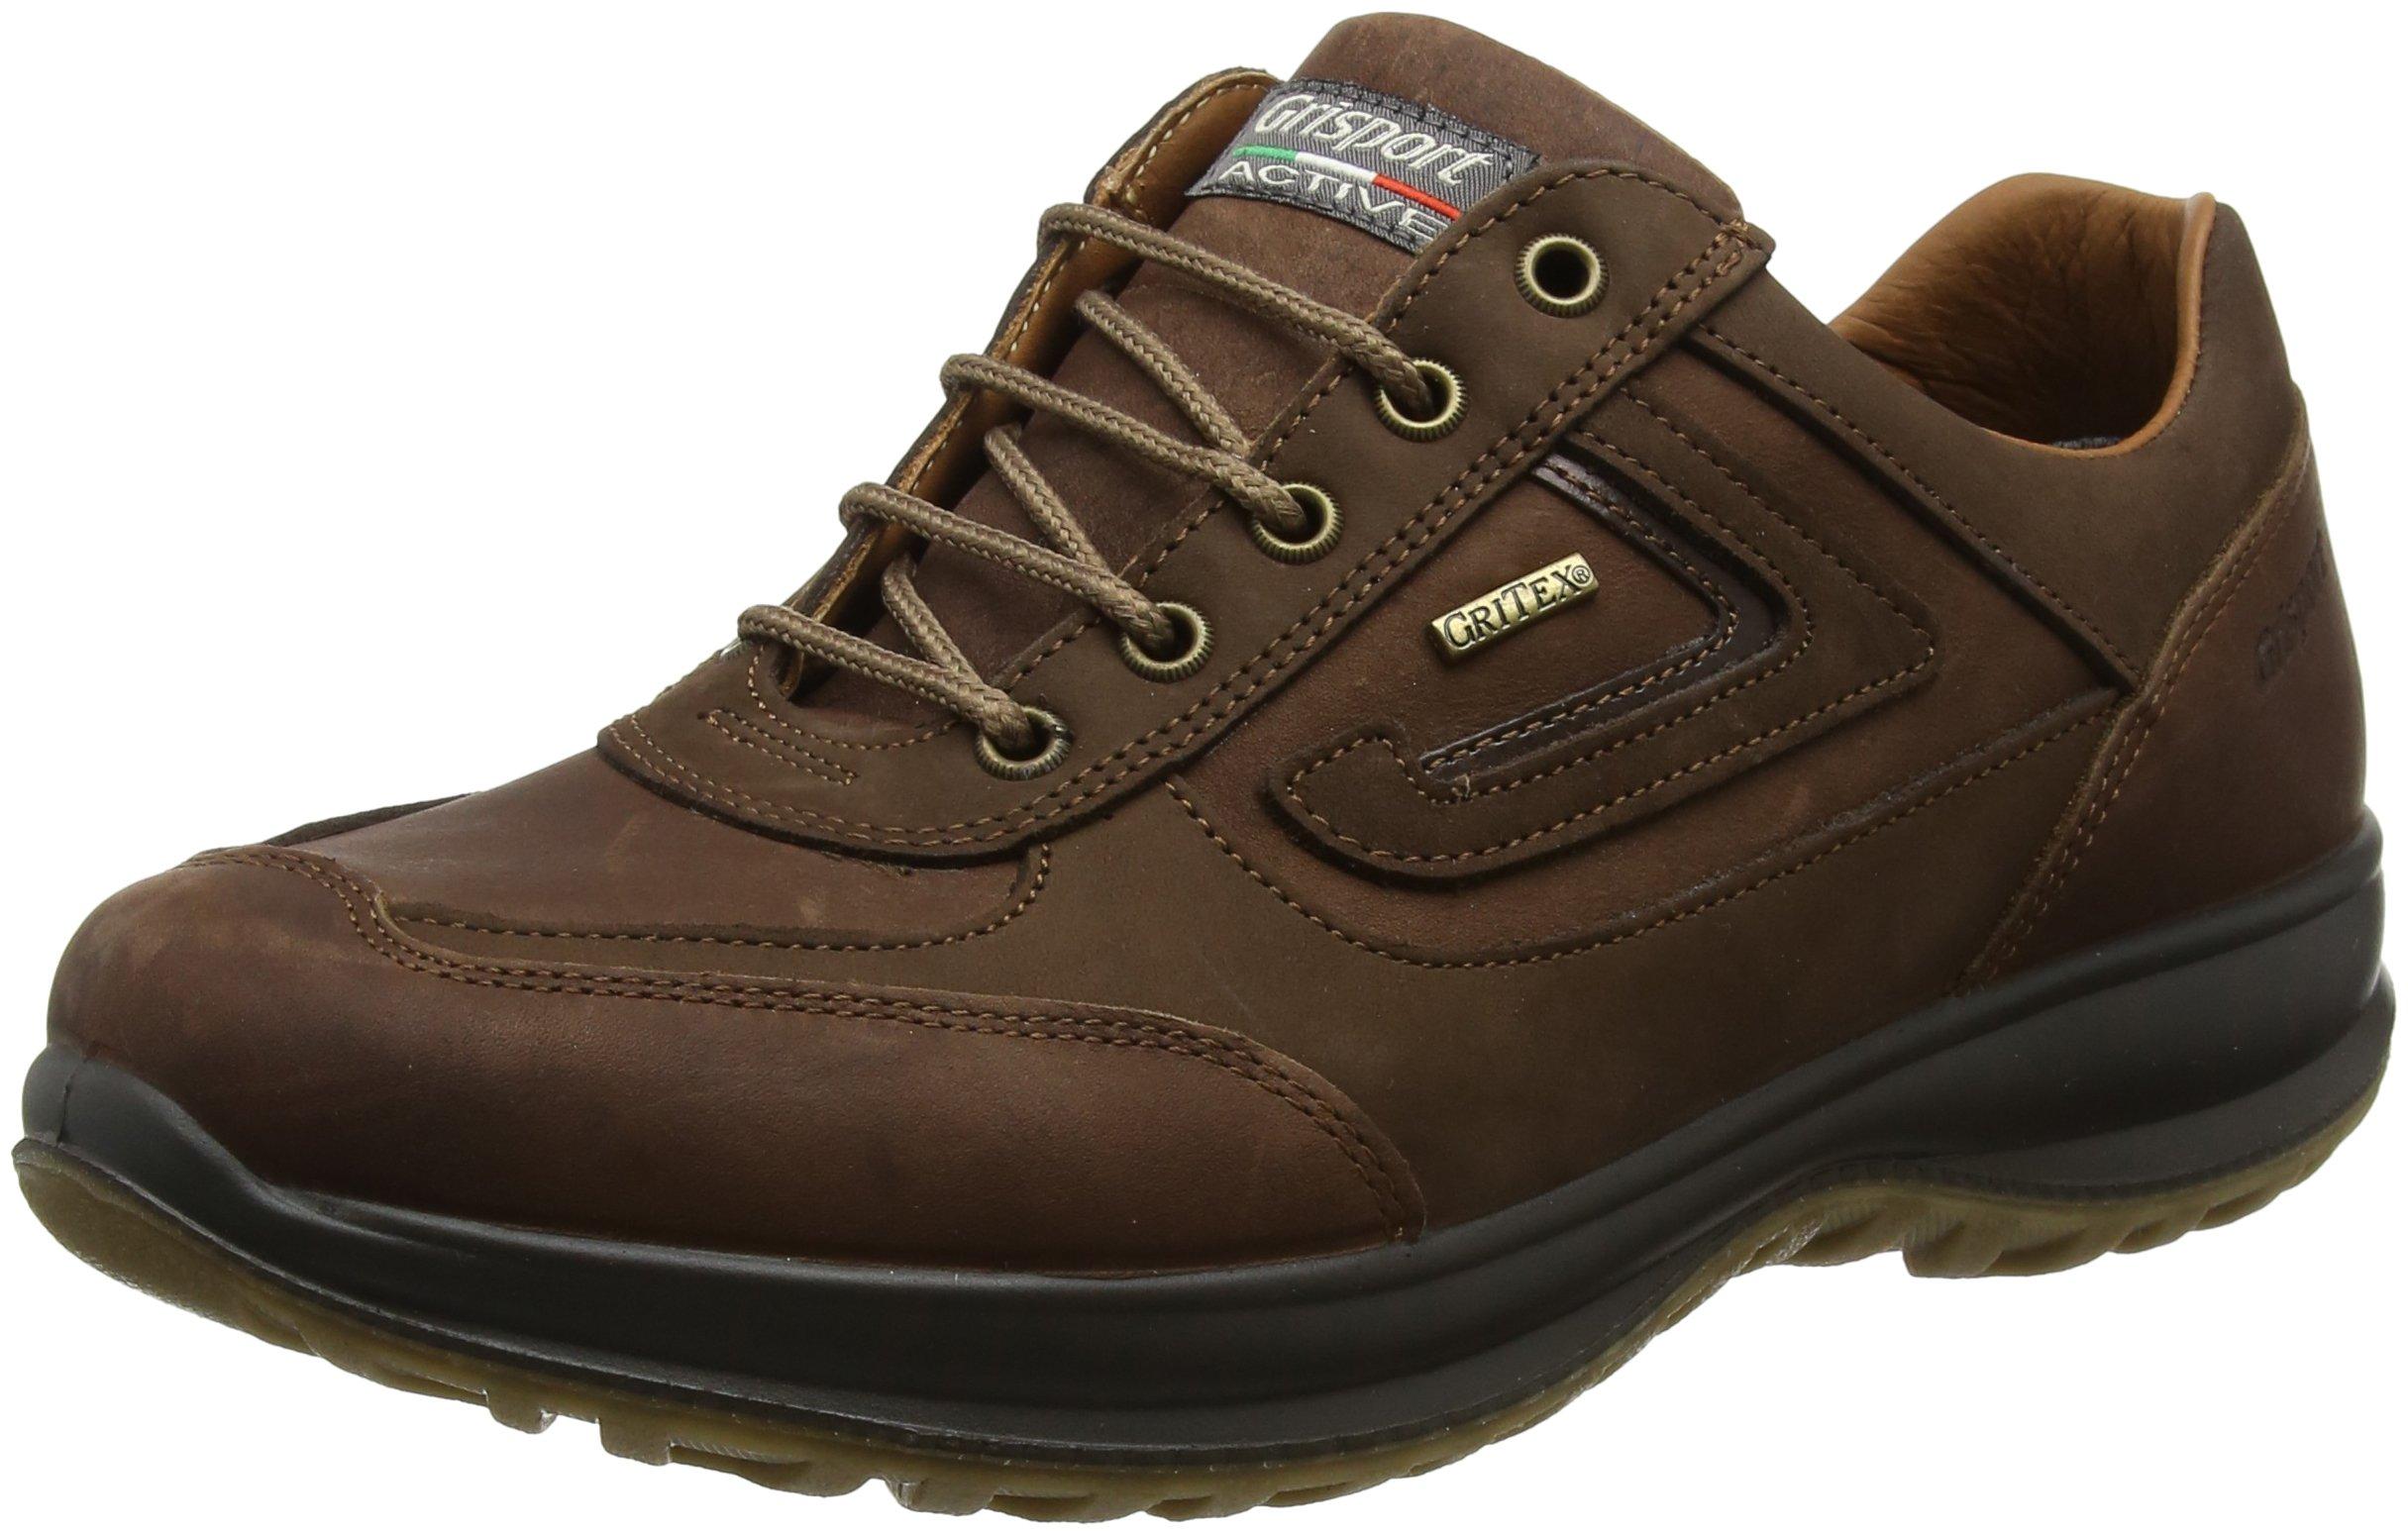 Grisport Men's Airwalker Walking Shoes 1